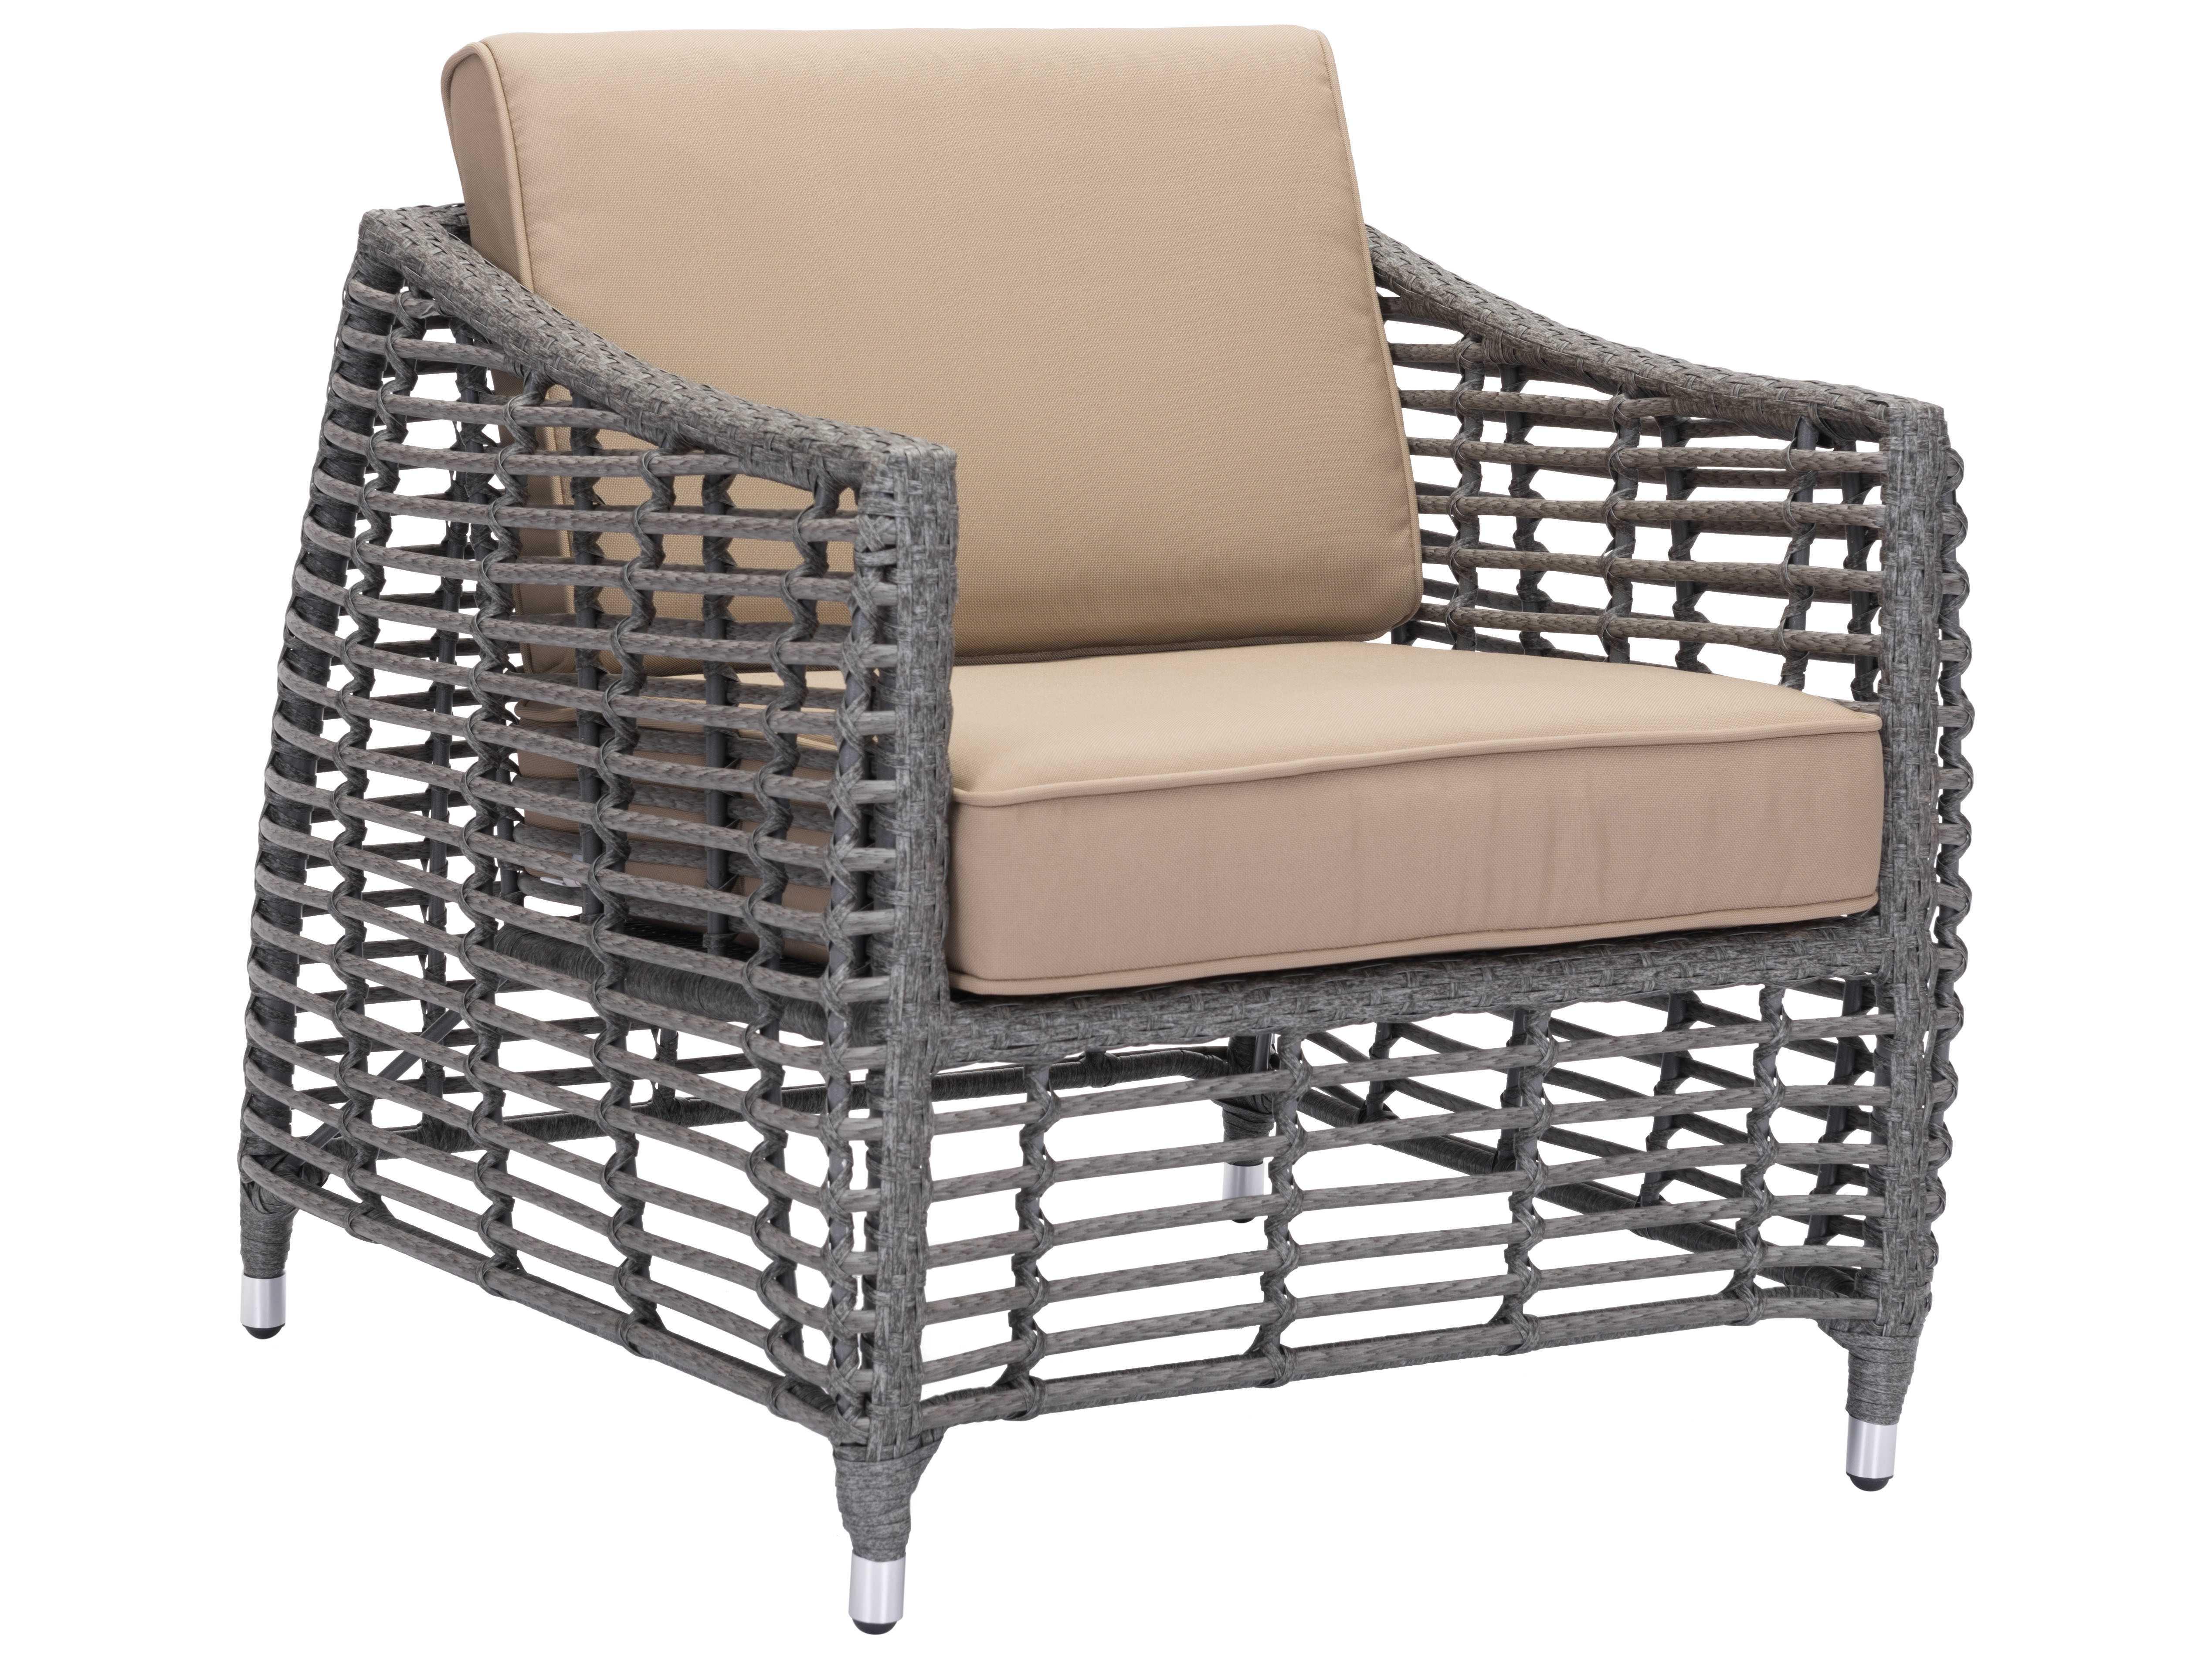 Zuo Outdoor Trek Beach Aluminum Wicker Arm Chair In Gray